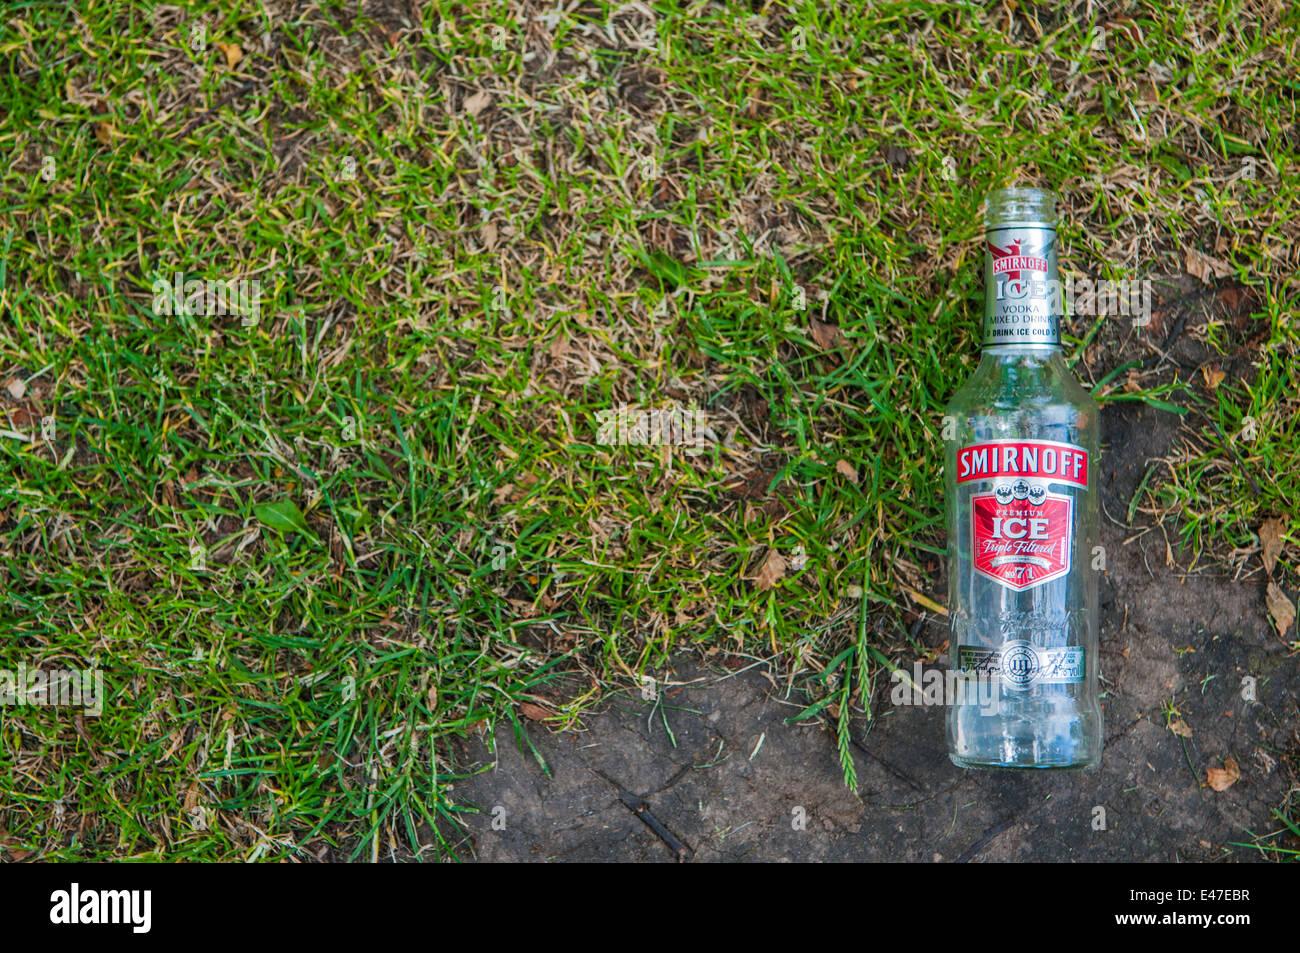 Smirnoff Ice bottle littering a grass area - Stock Image